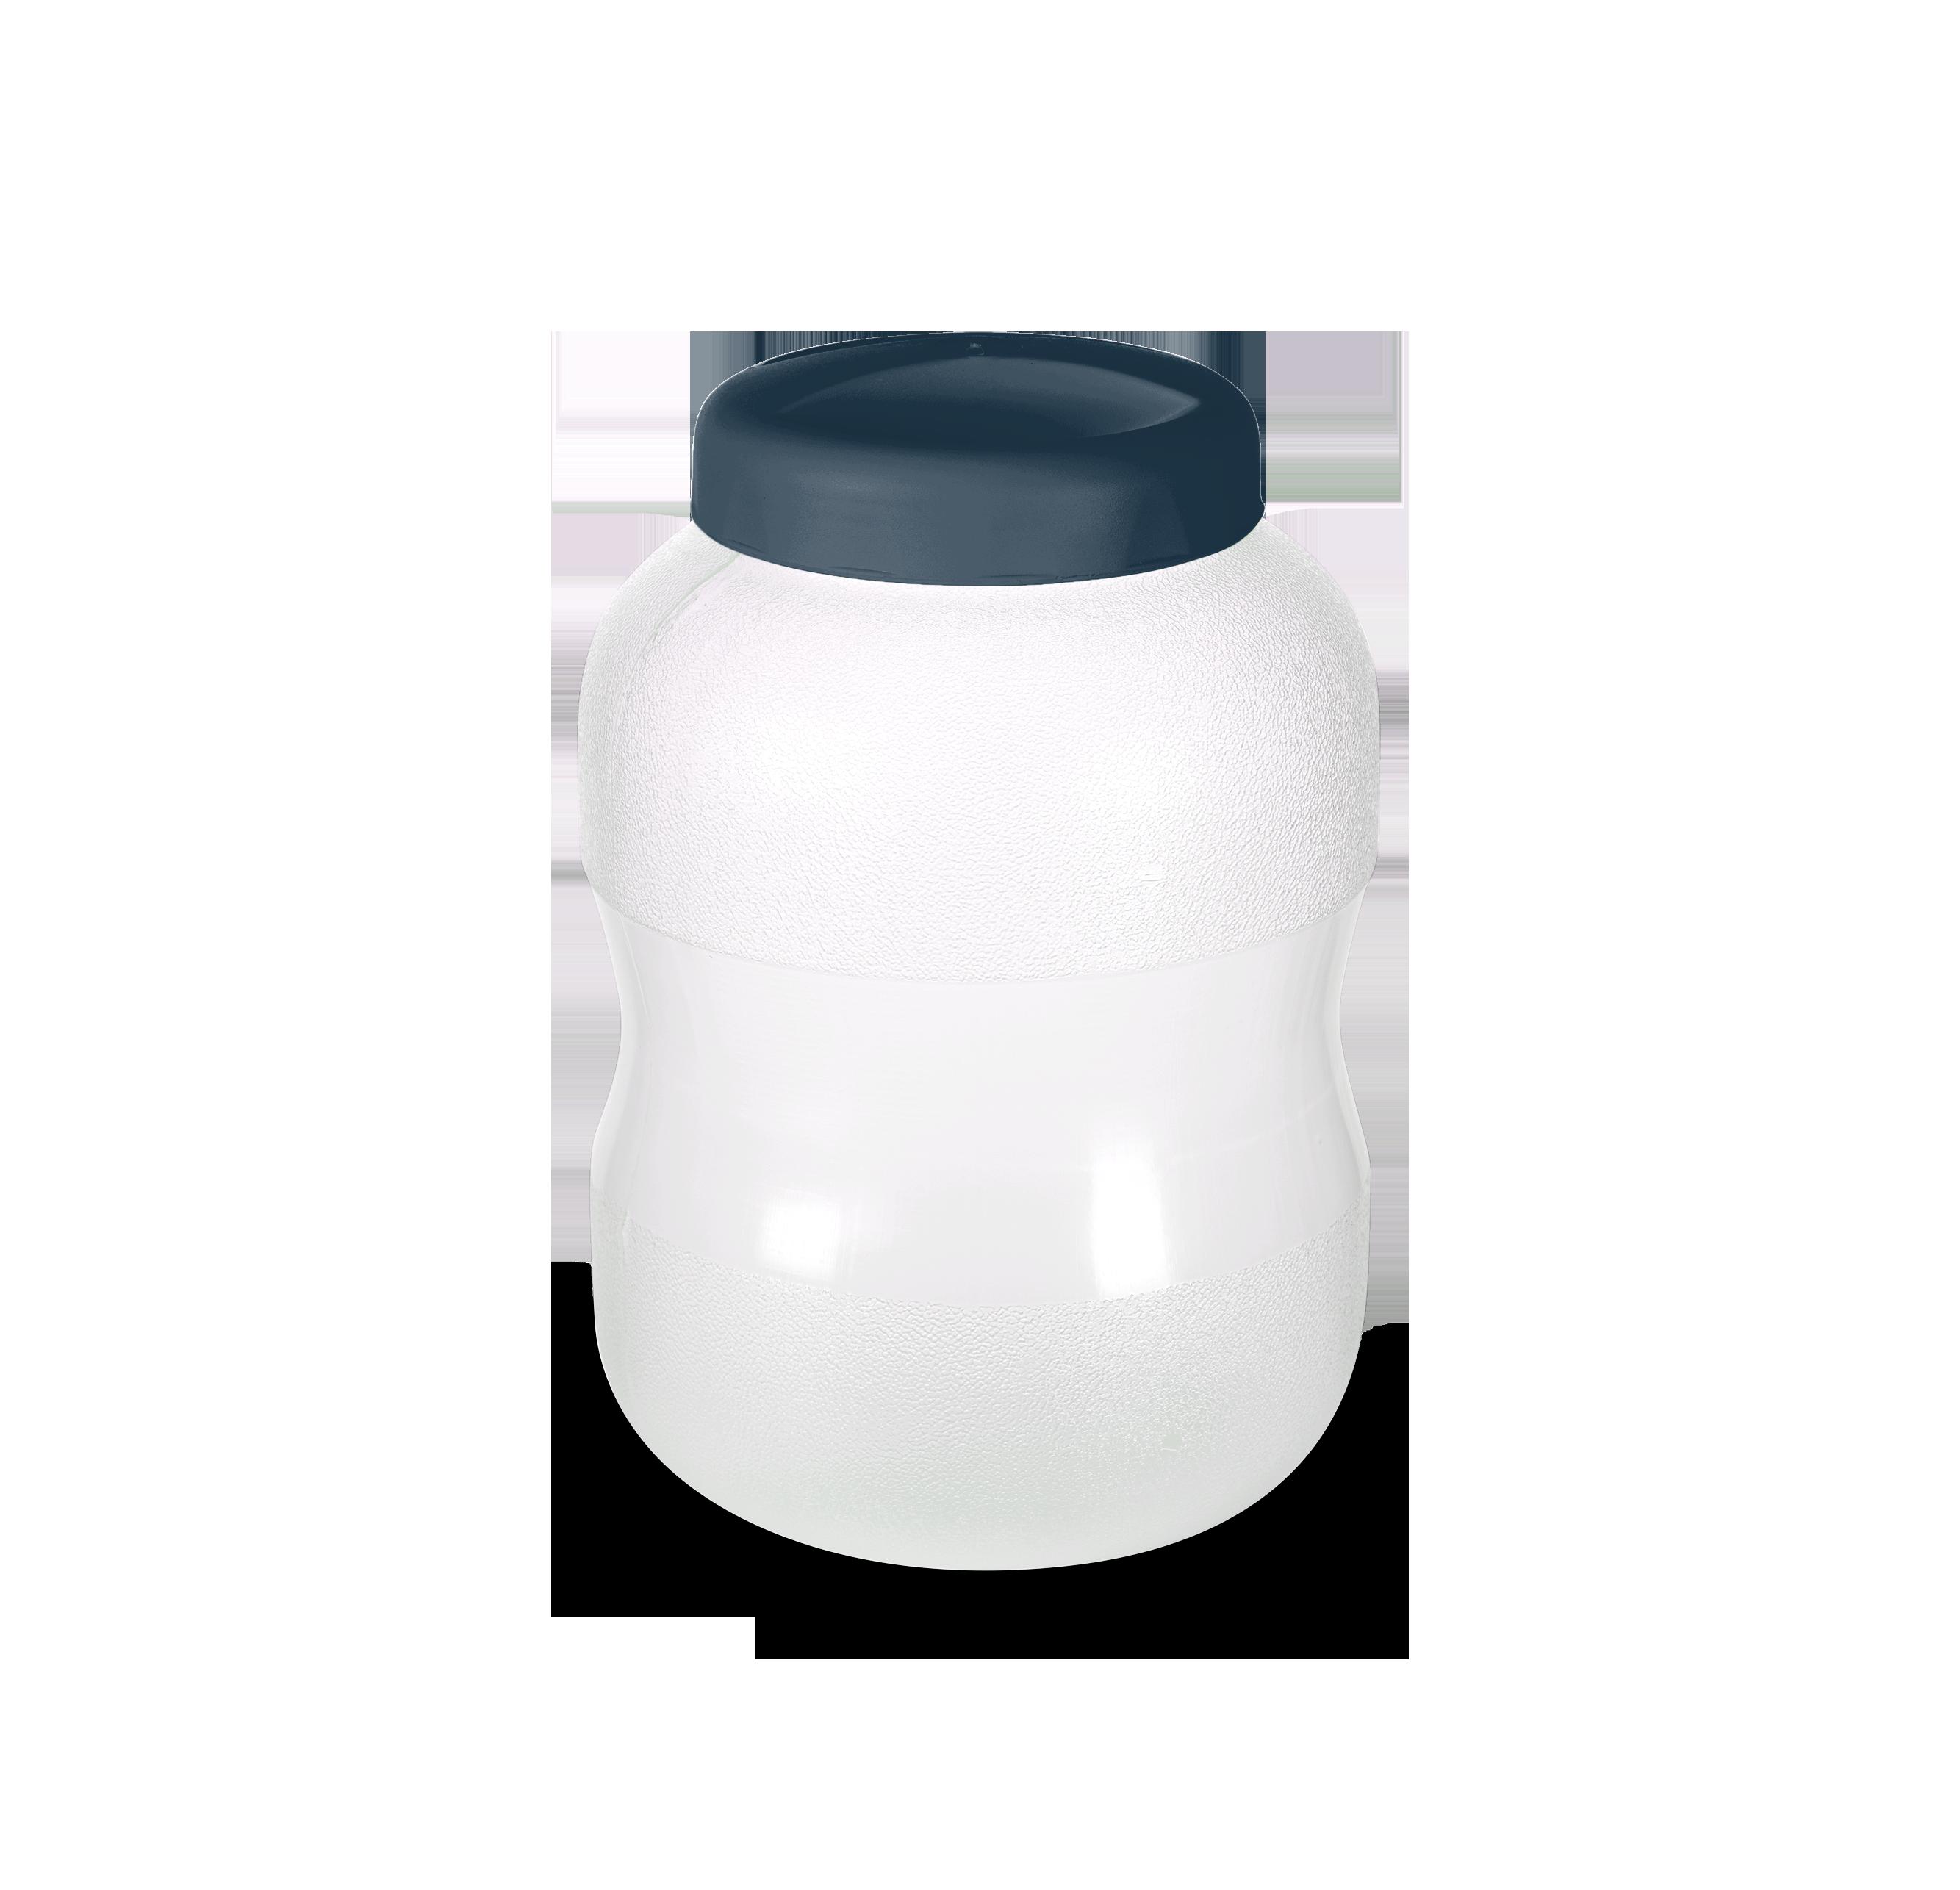 Imagem do produto: Bomboniere 1L 2903